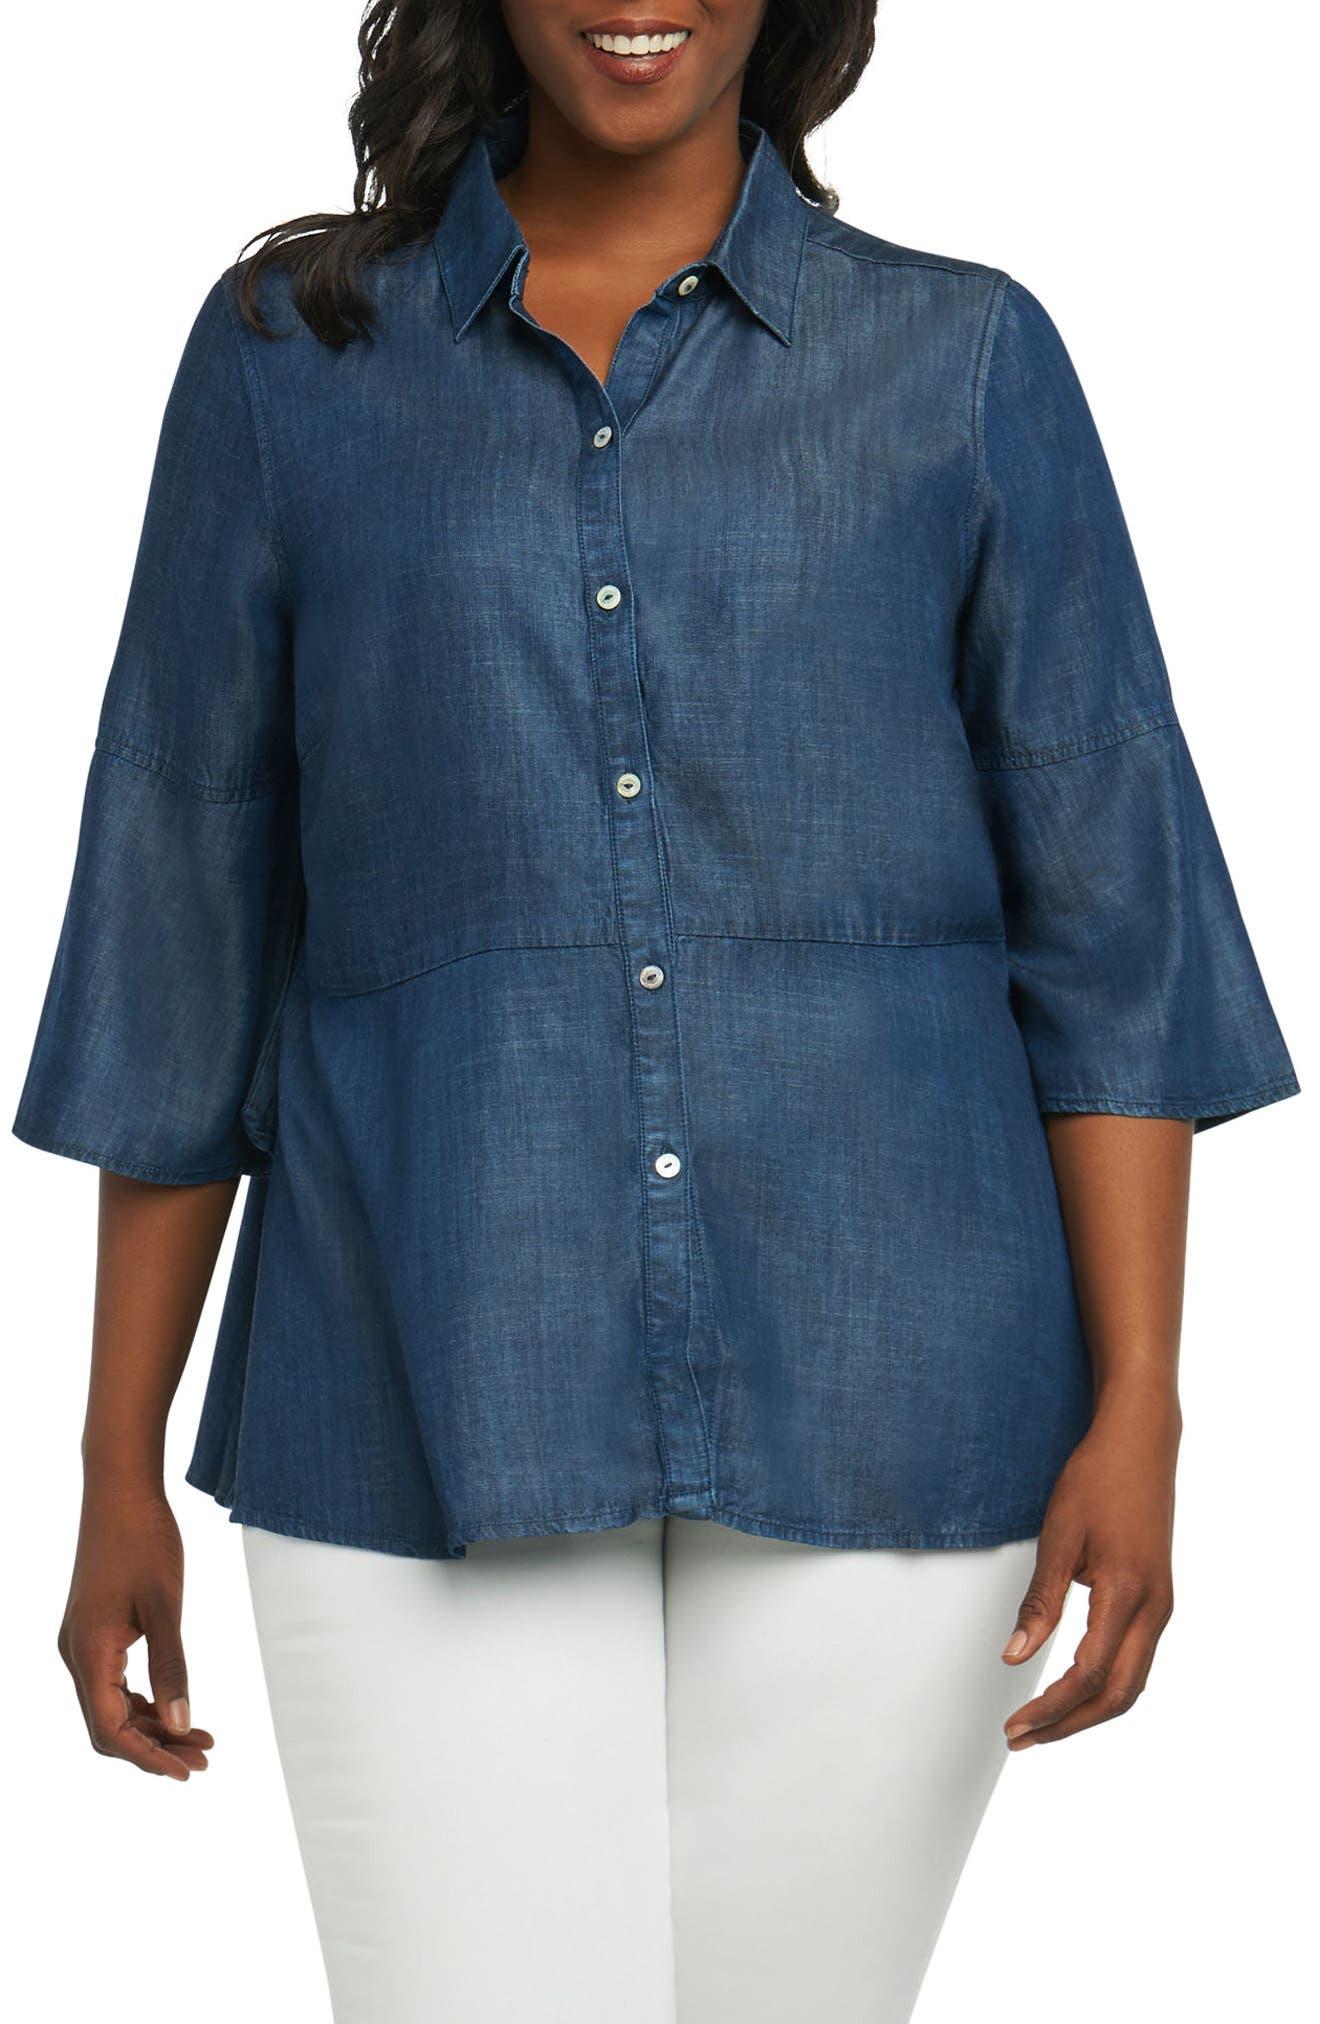 Estelle Chambray Shirt,                         Main,                         color, Navy